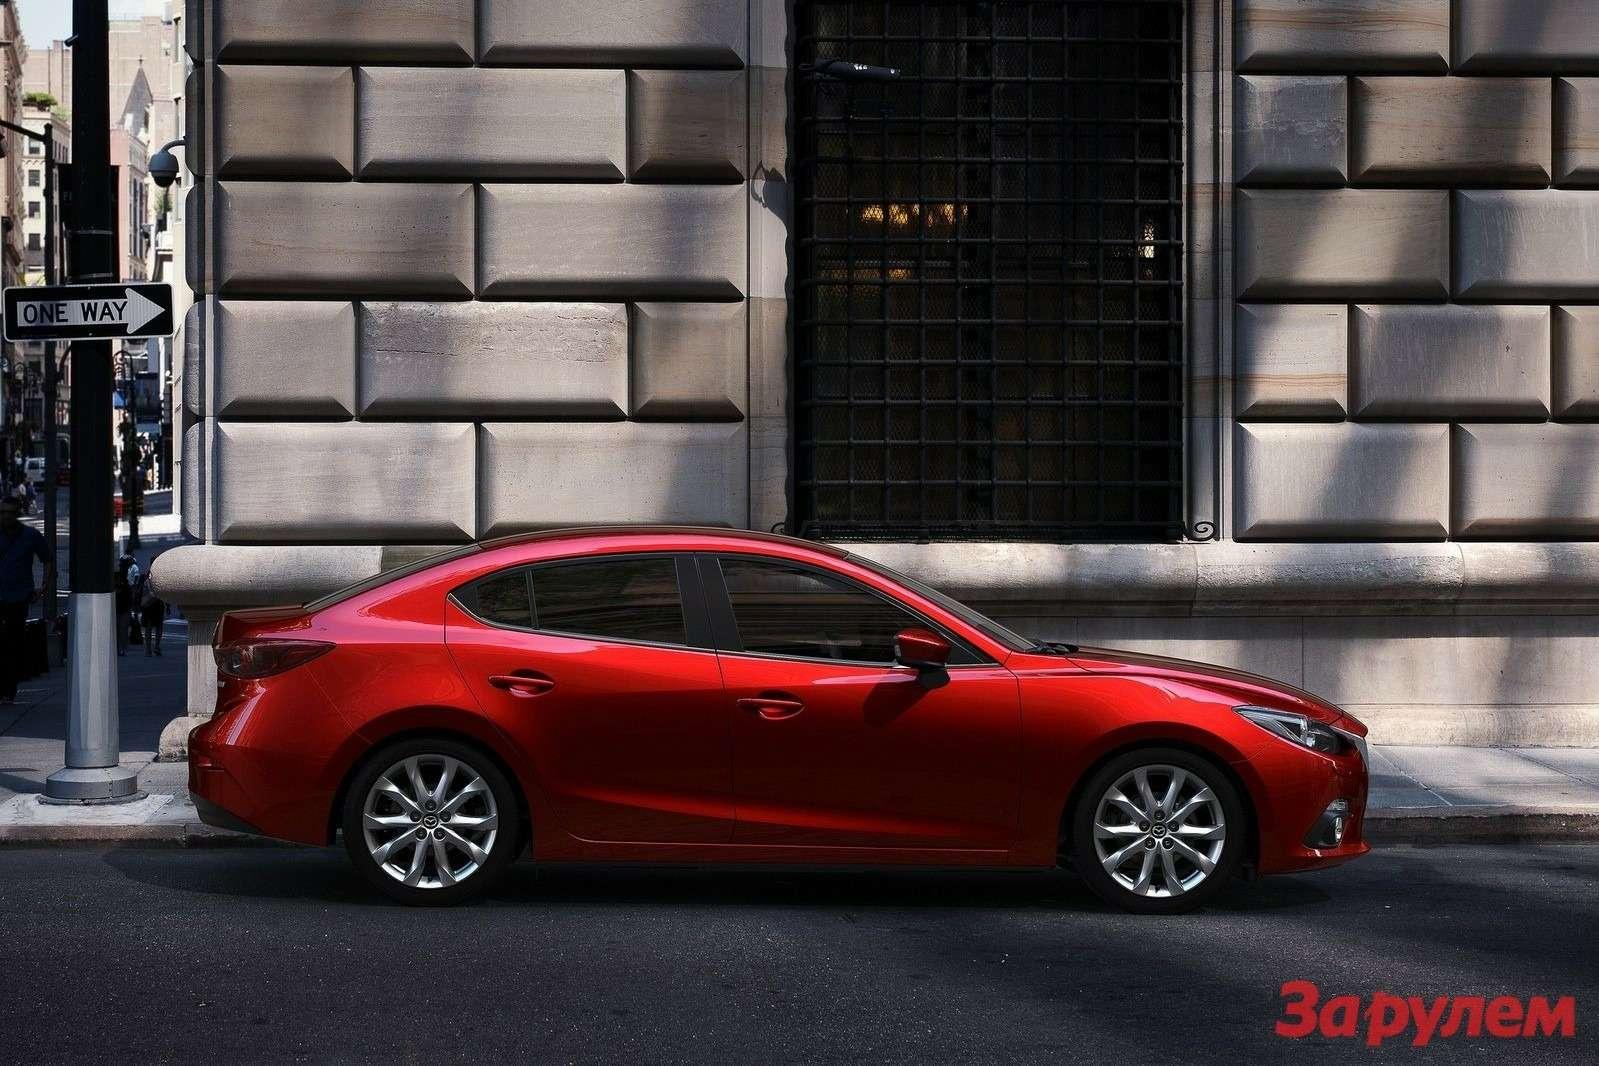 Mazda 3Sedan 2014 1600x1200 wallpaper 1e